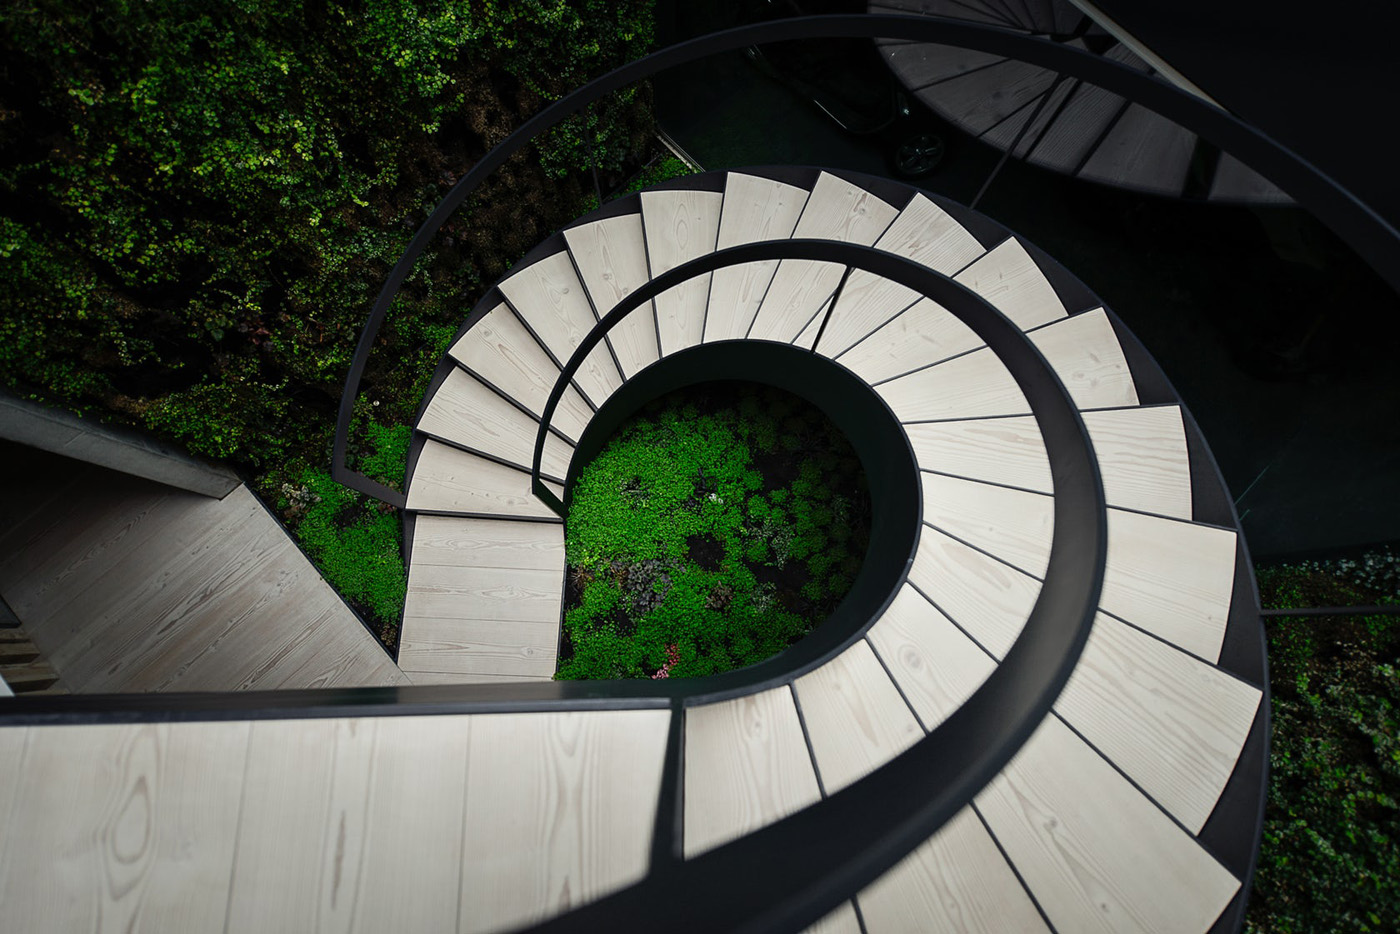 balustrades.jpg